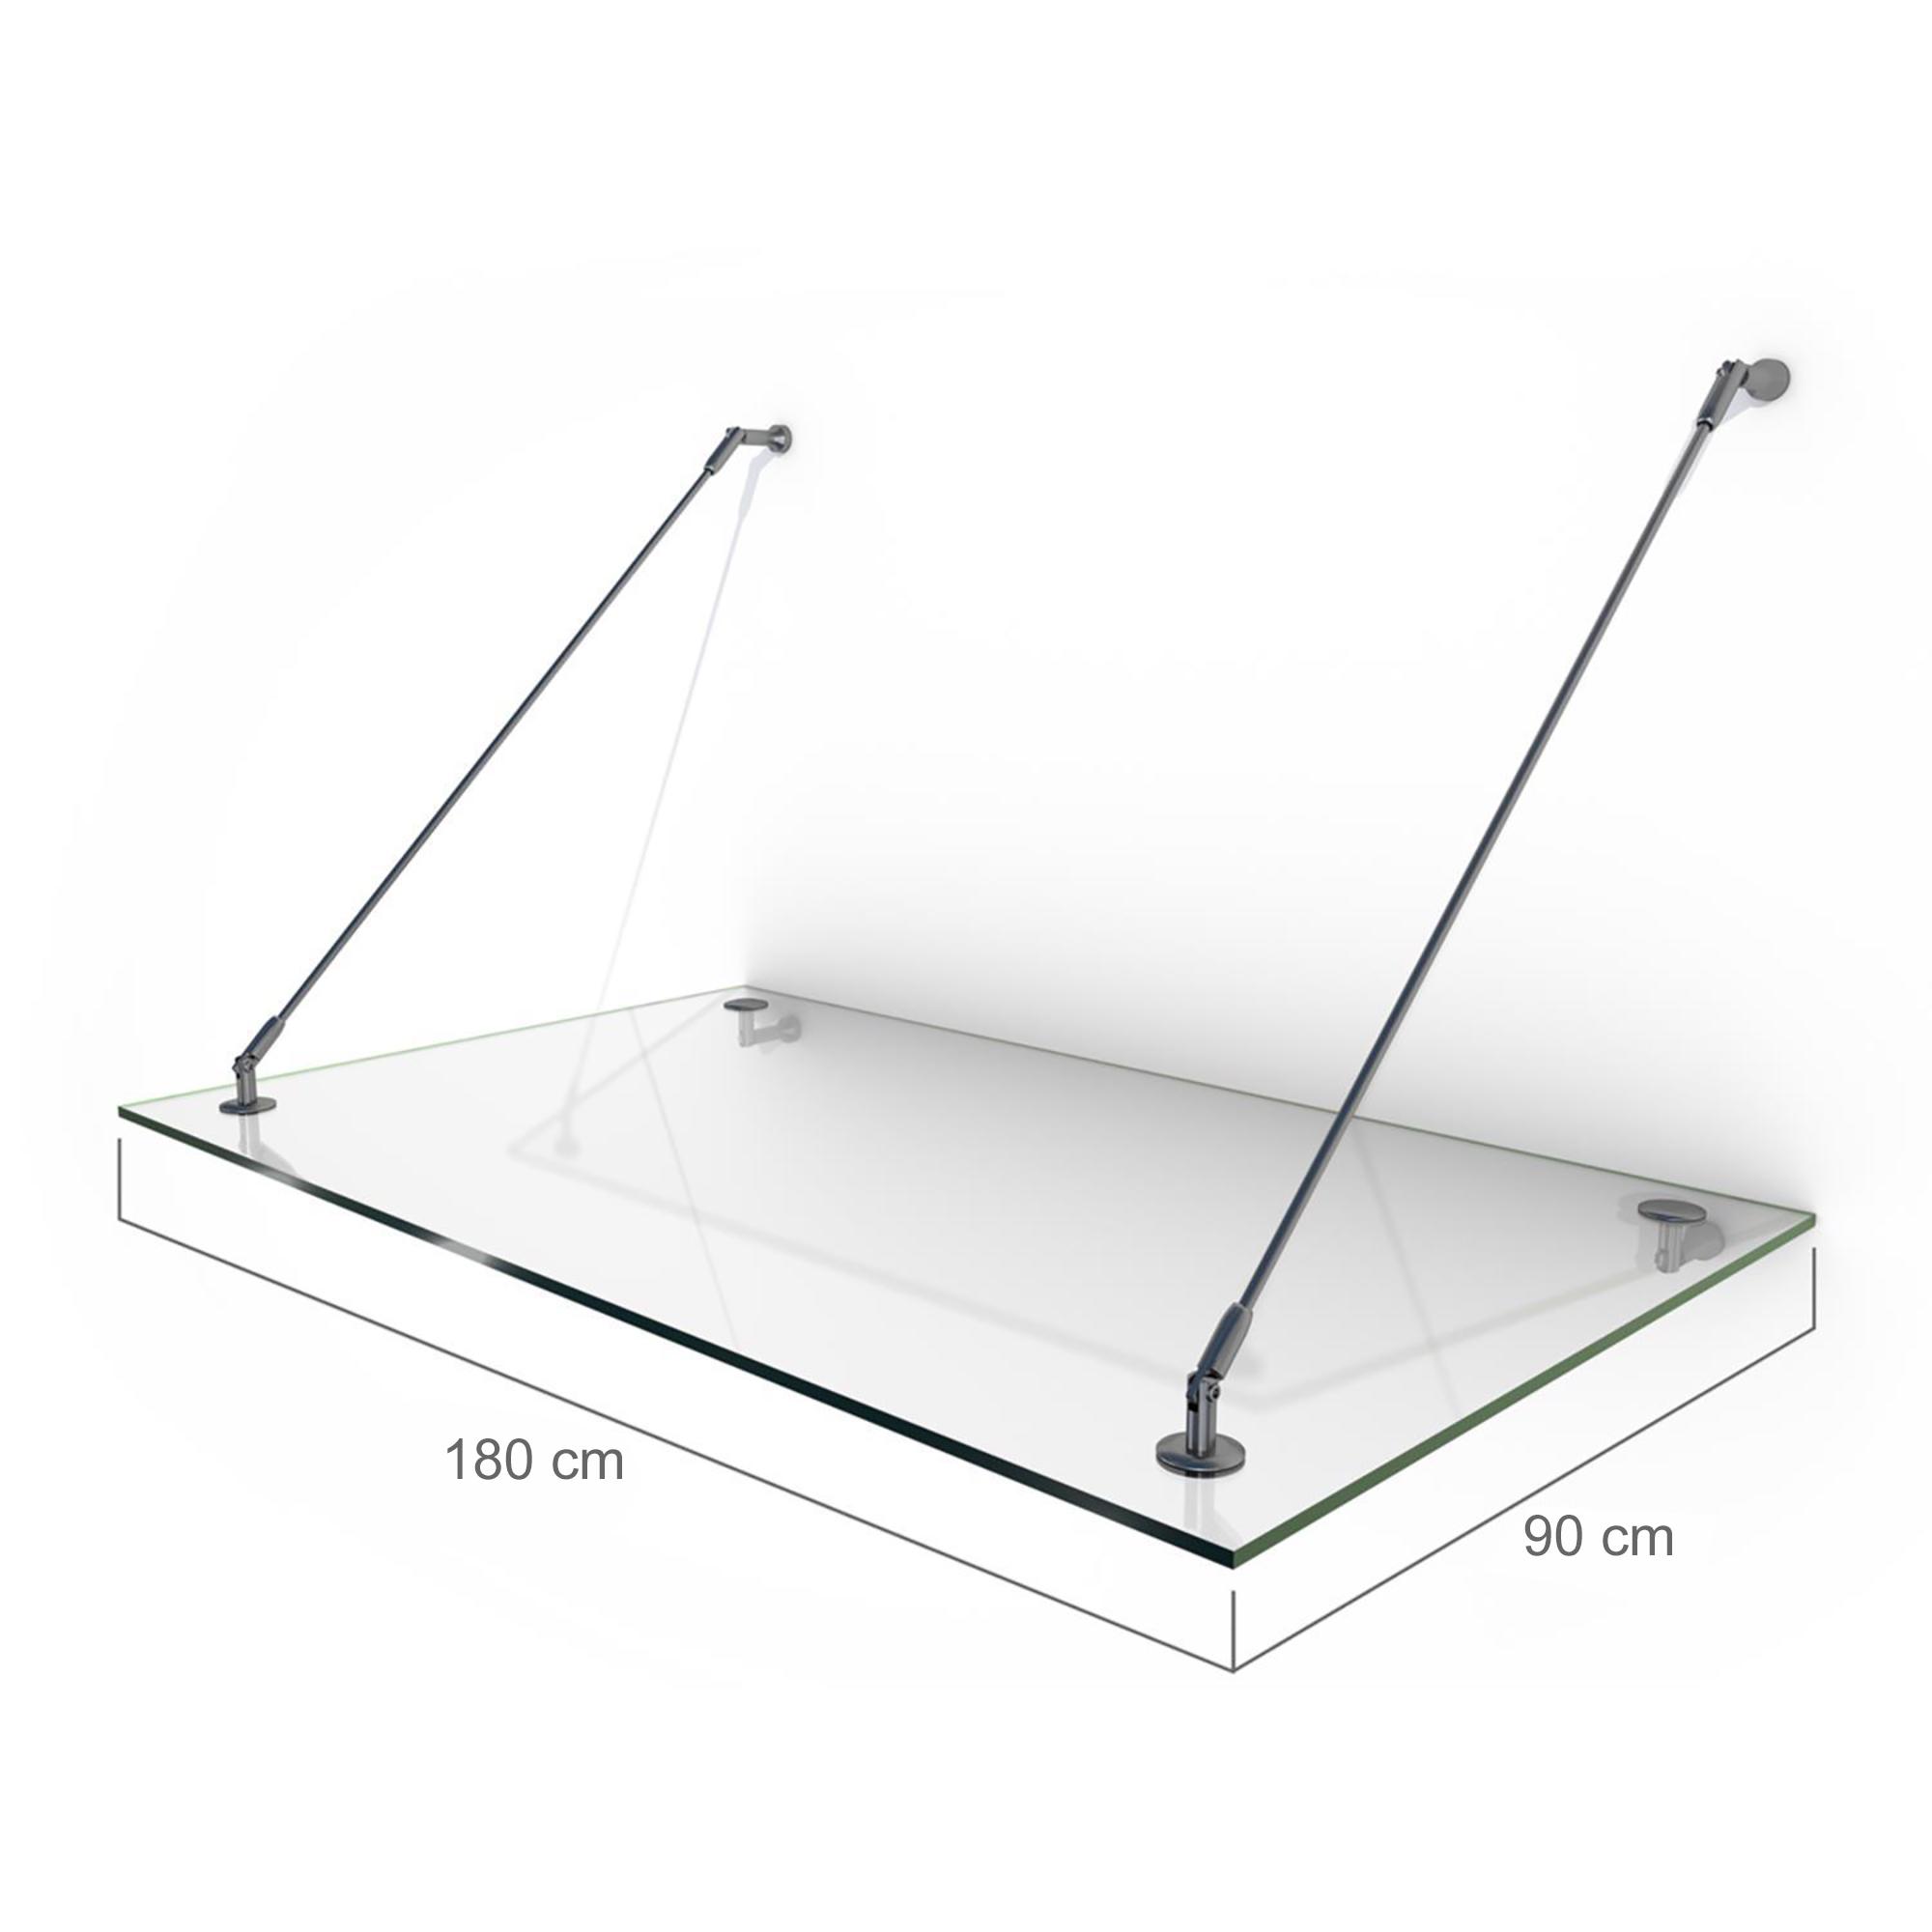 Nemaxx Glasvordach GVK 180 x 90 cm  - KLAR, VSG Türvordach, Haustür Überdachung inkl.Edelstahl Halter